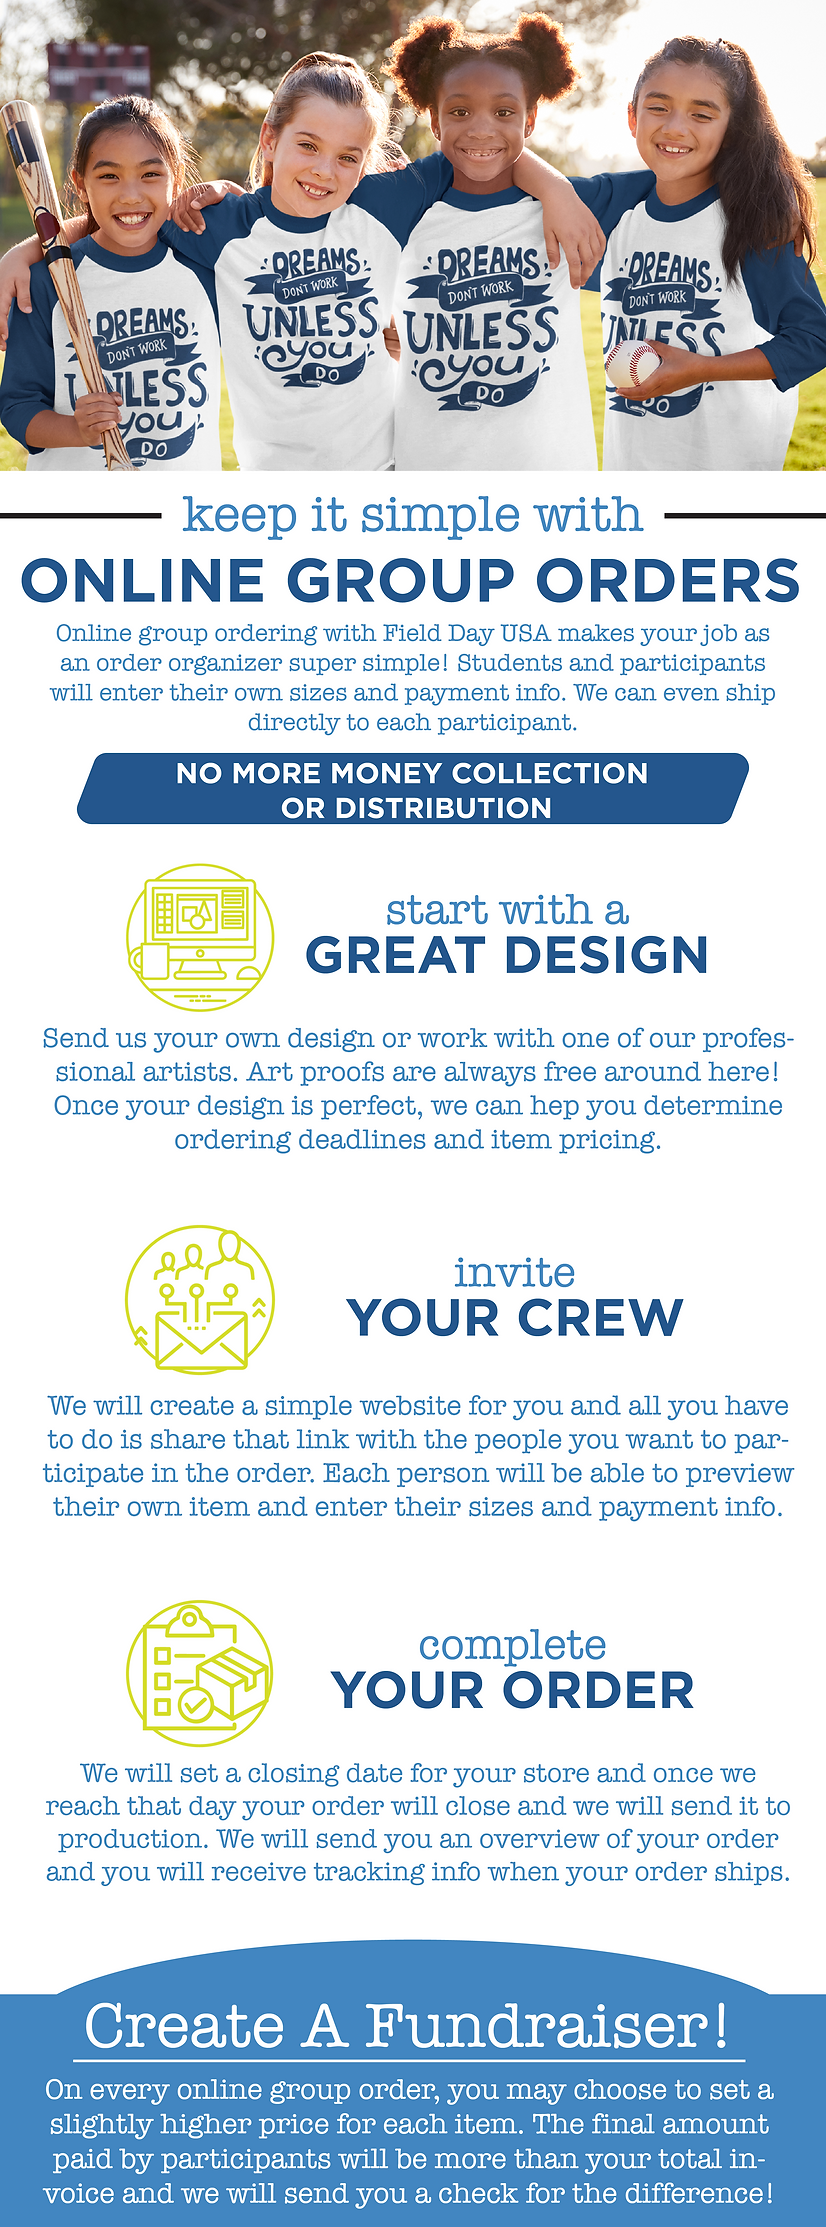 online group orders-01.png